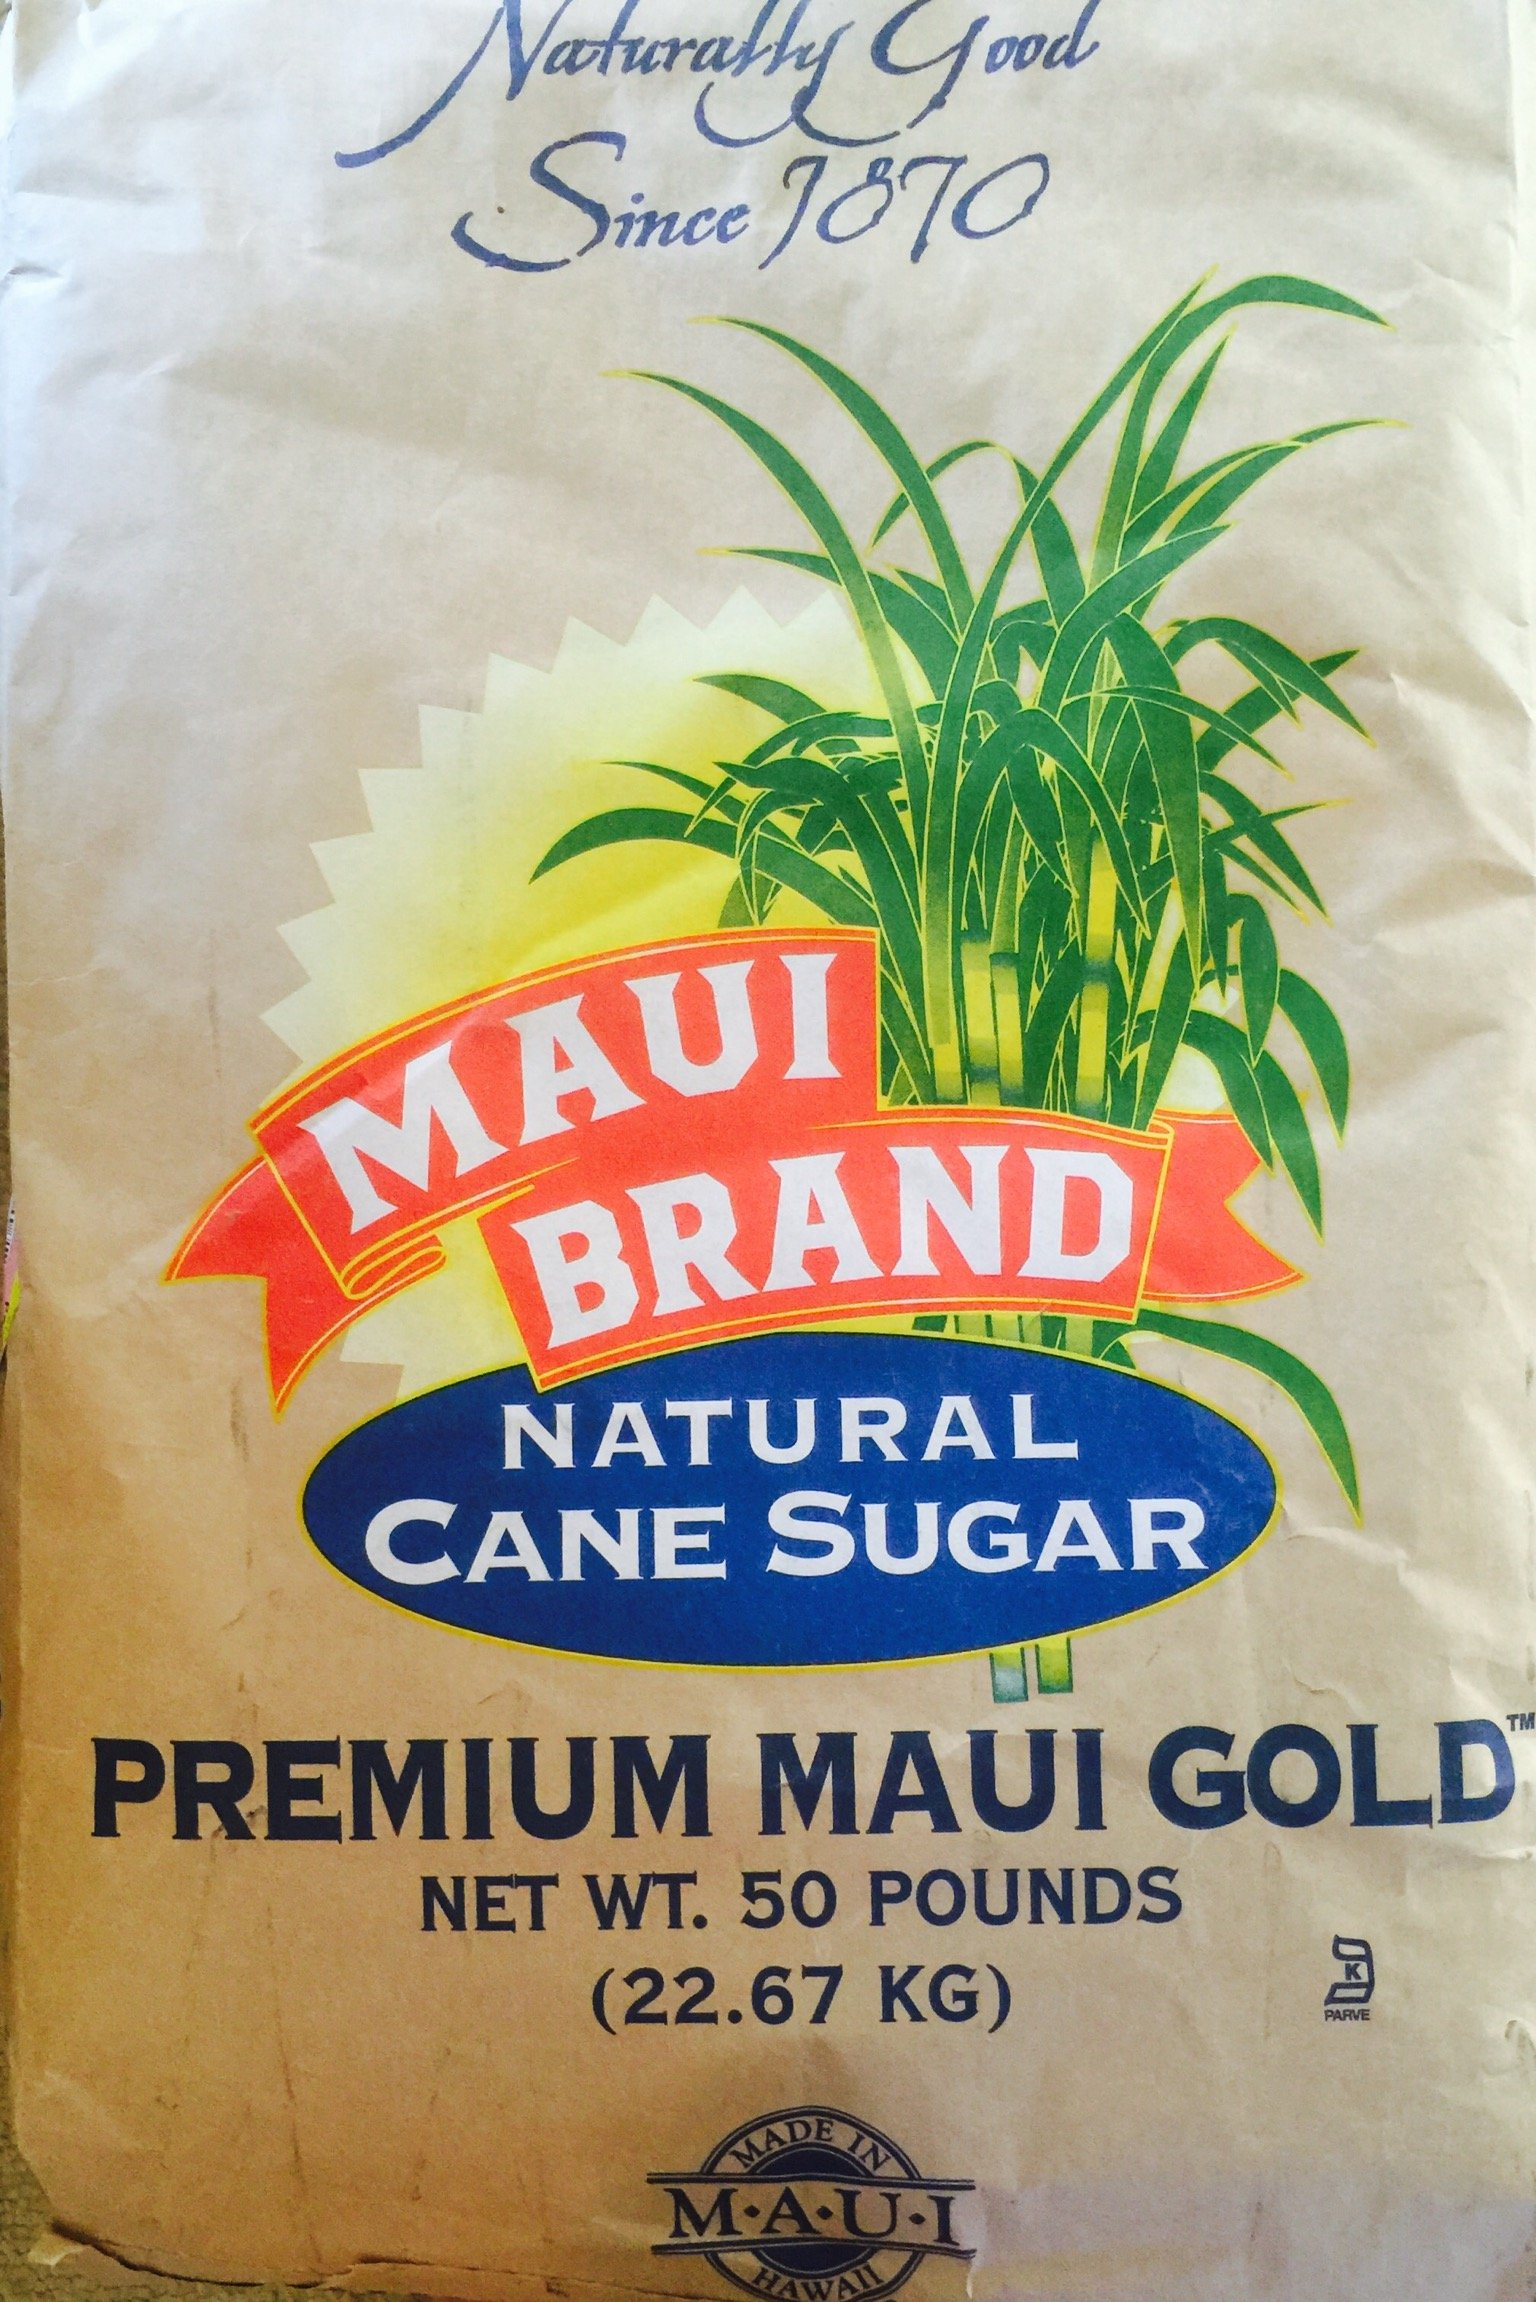 Maui Brand Natural Premium Maui Gold Hawaiian Sugar 50 pound bag